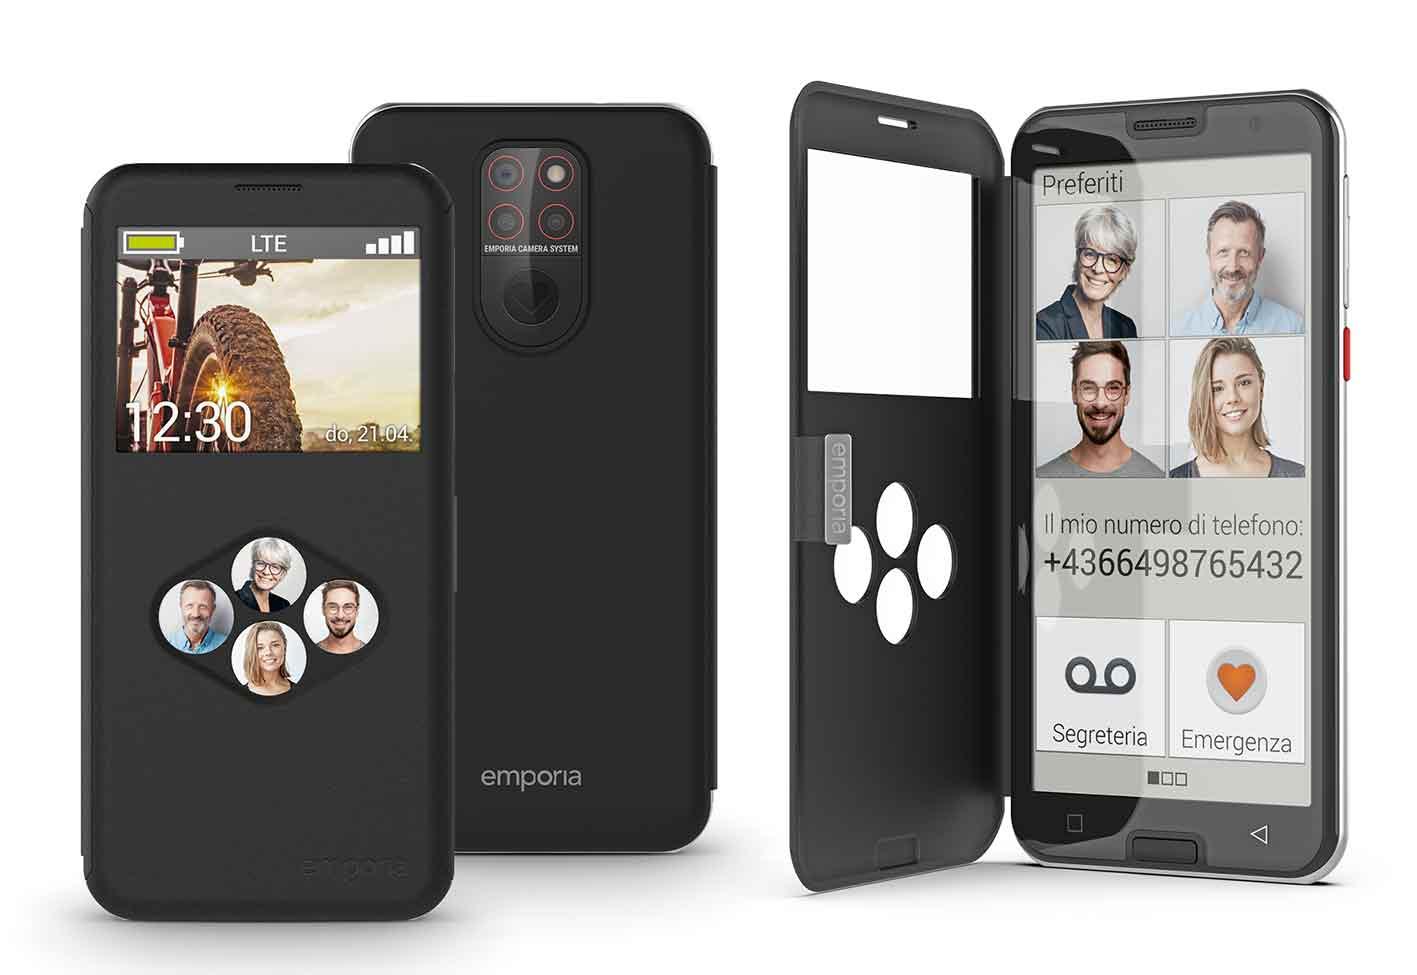 emporia smart.5 senior phone